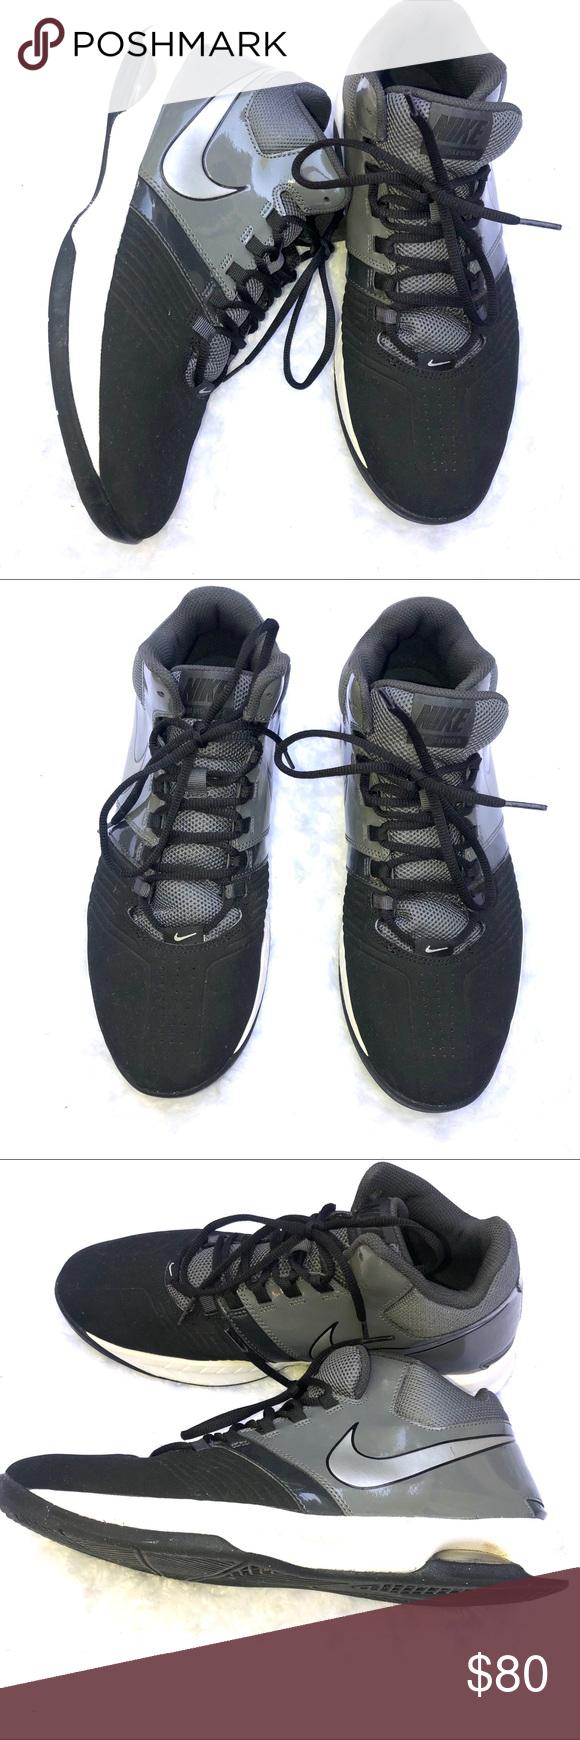 10f21c5b013 Nike Air Visi Pro V NBK Black Nubuck Basketball Nike Air Visi Pro V NBK  Mens 653664-005 Black Nubuck Basketball Shoes Size 12 Nike Shoes Athletic  Shoes